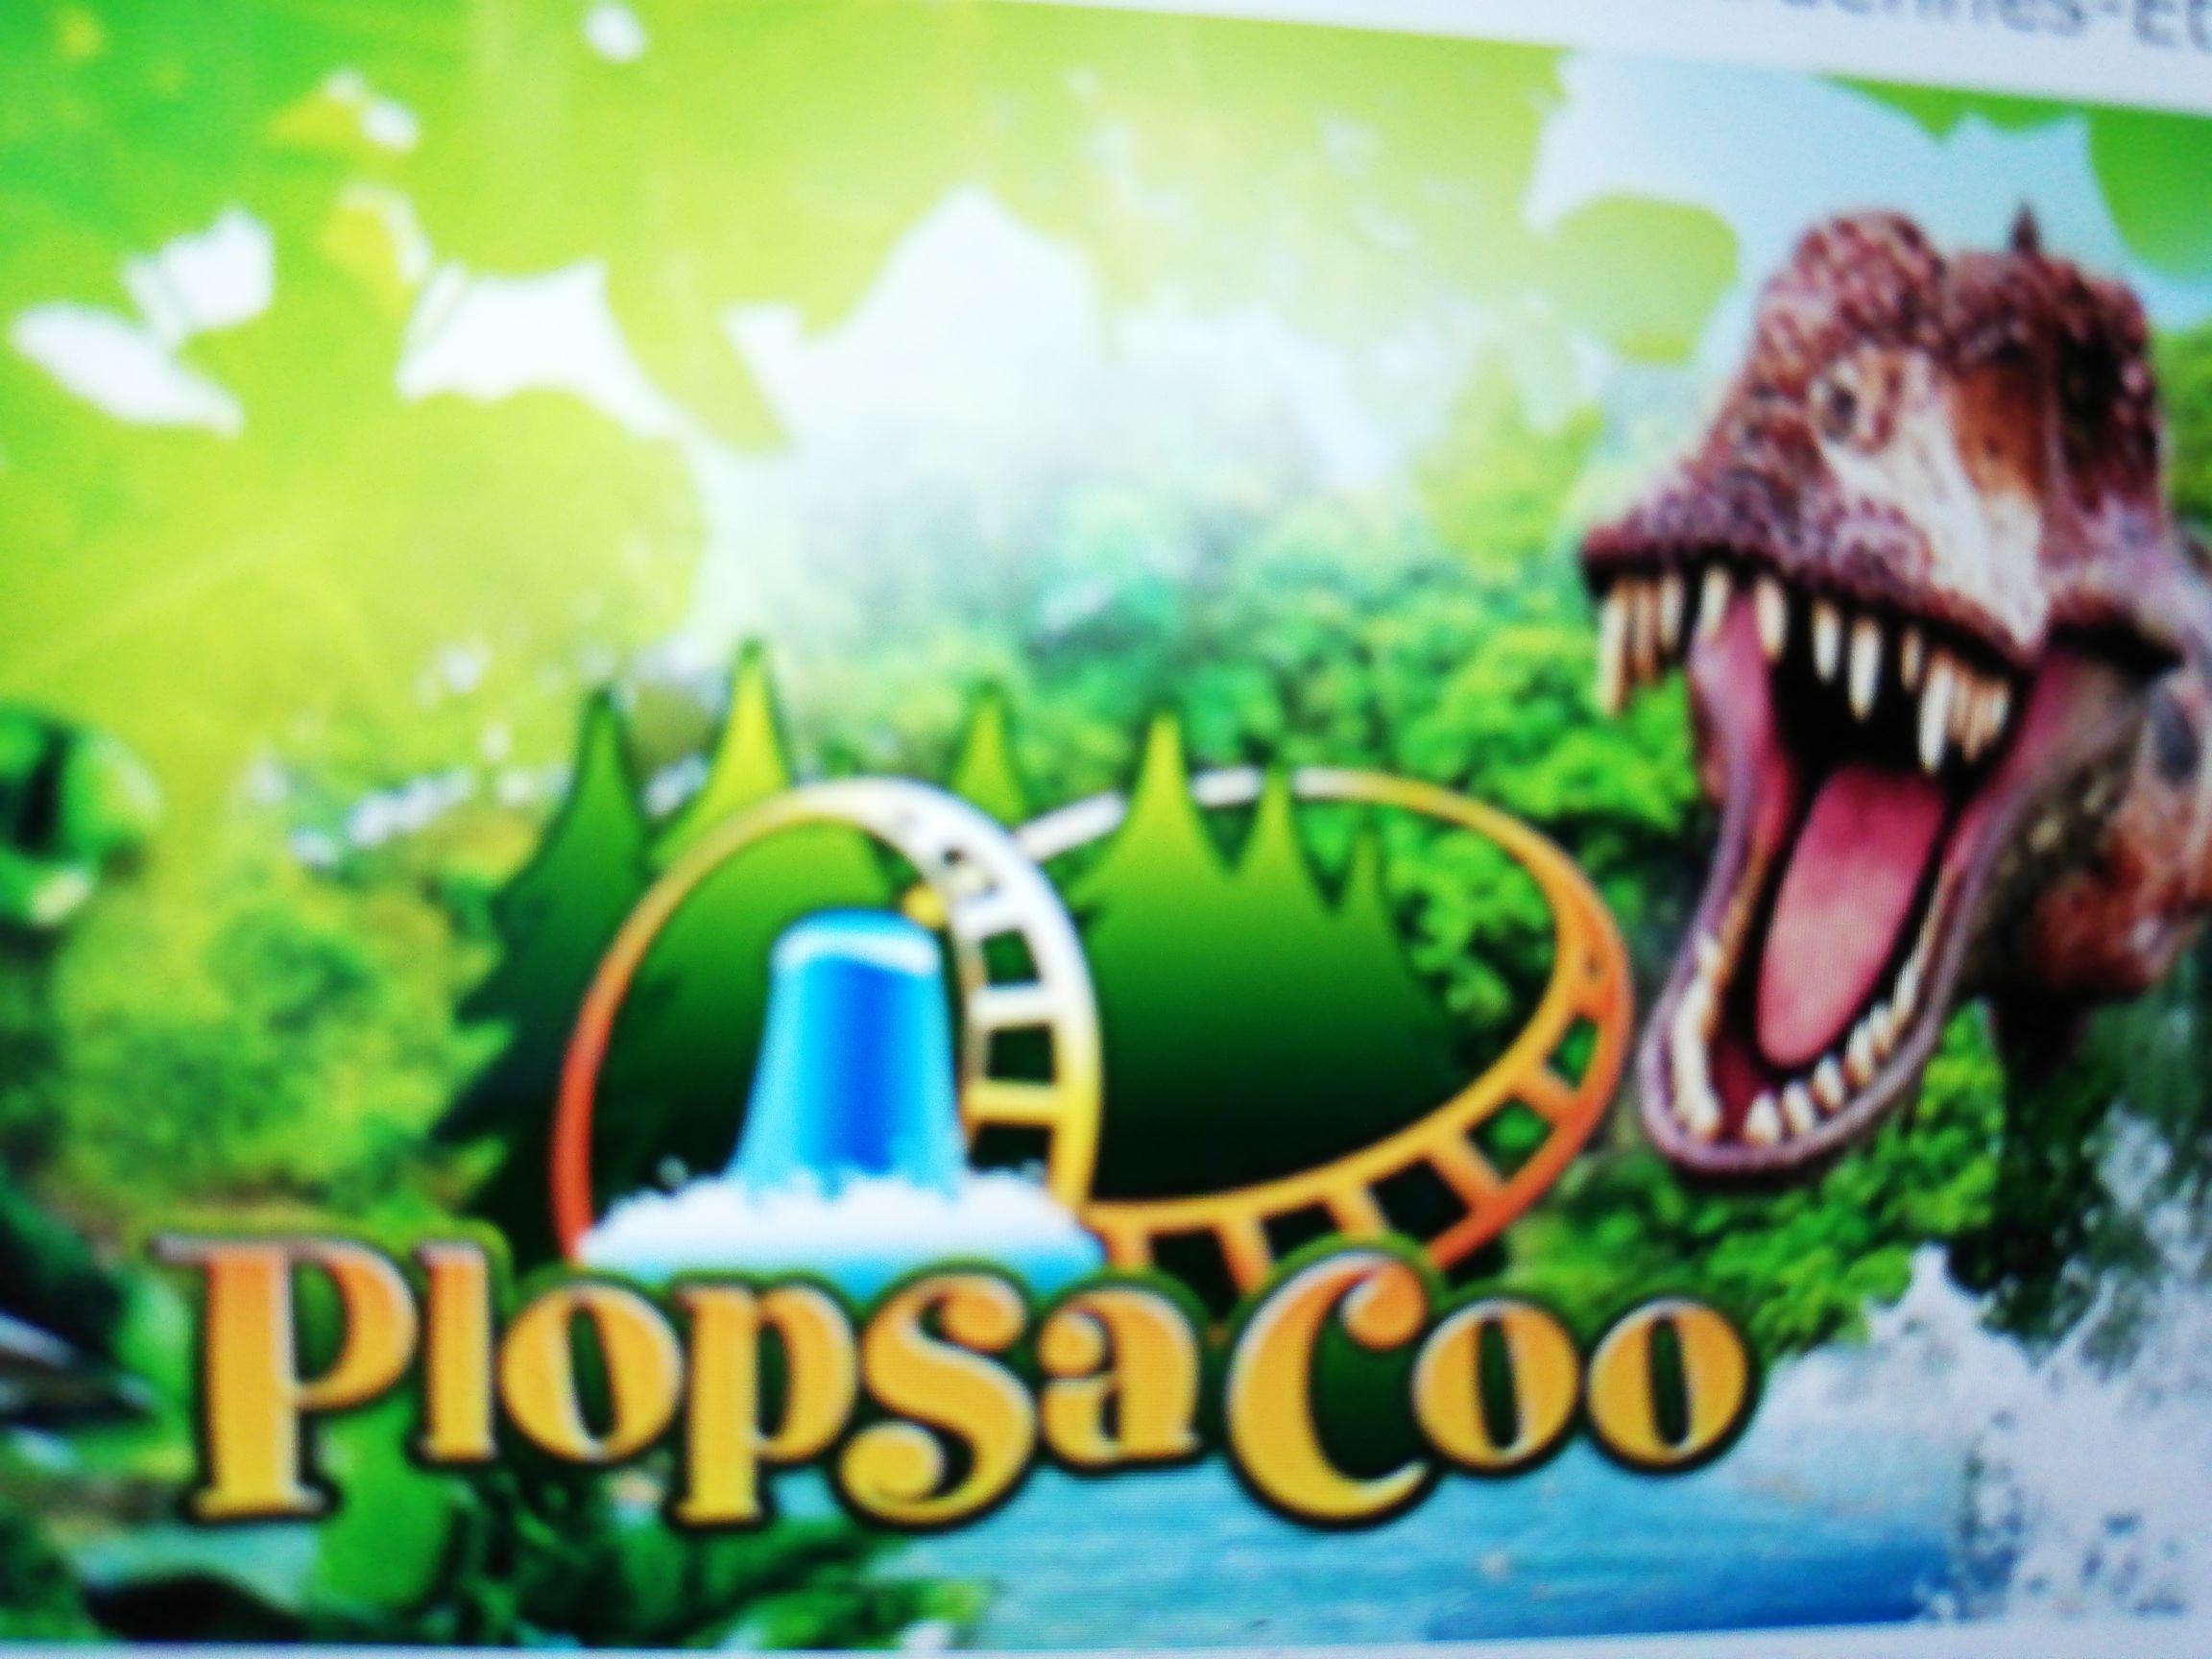 Korting Plopsa  Coo (omgeving stavelot - België)